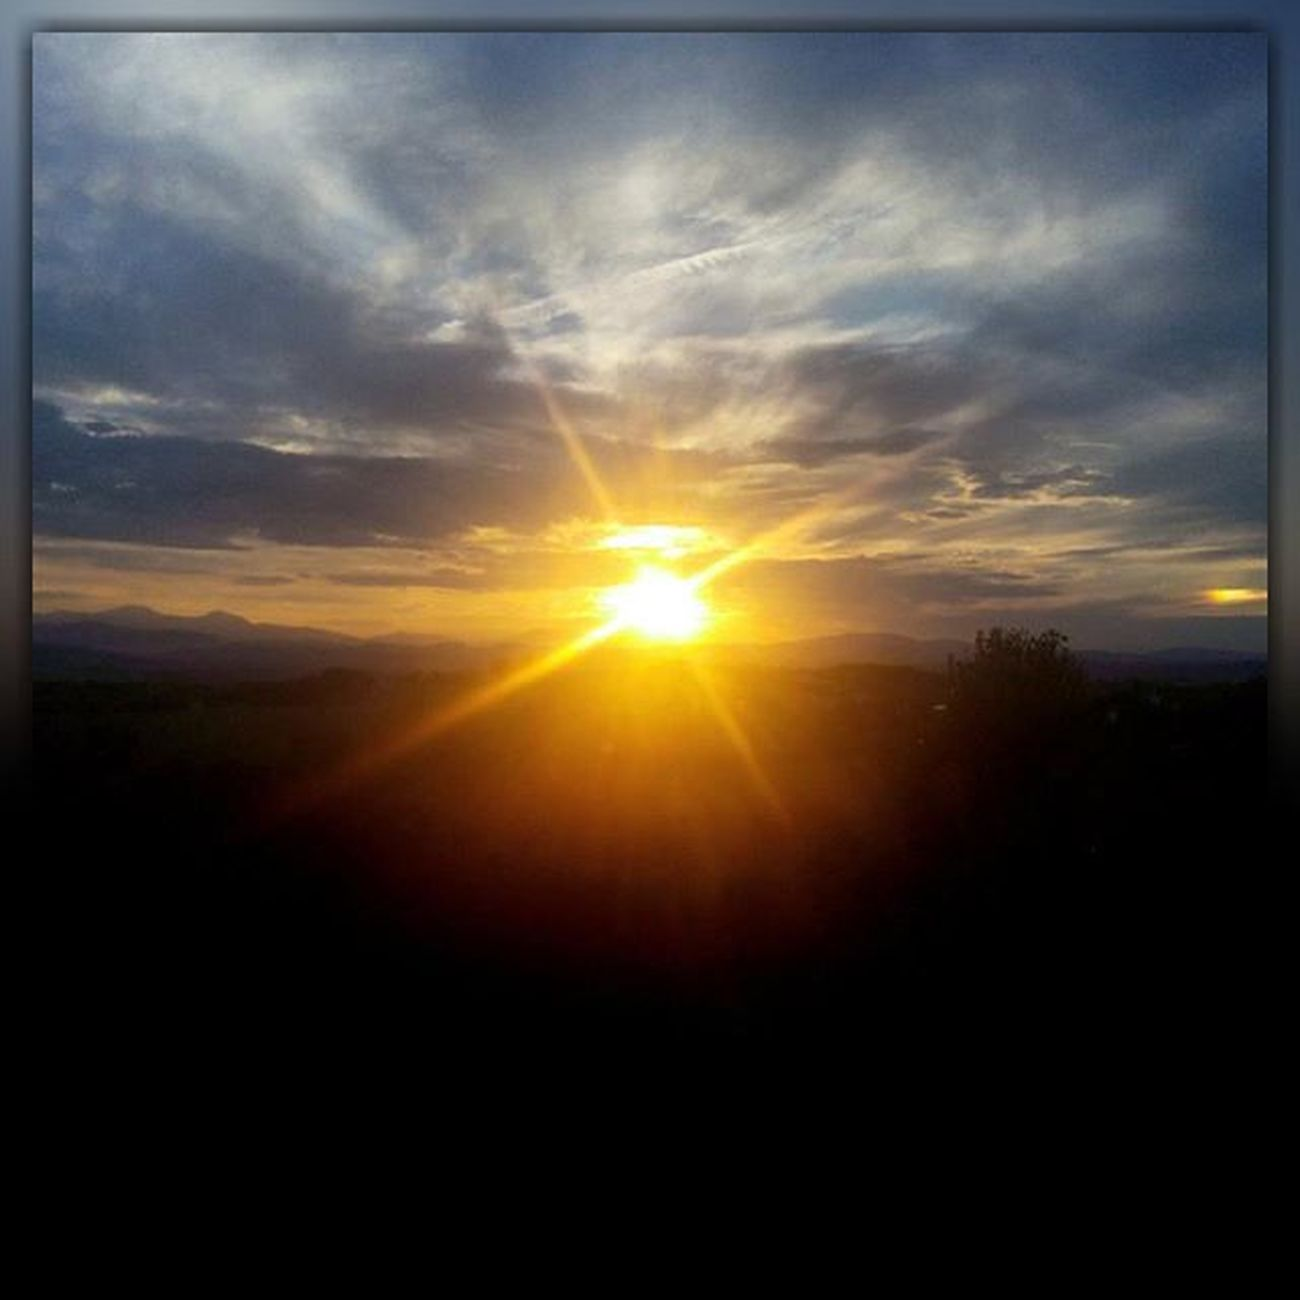 Tramonto Paesaggio Sunlight Sun Landscape Marche Marcheforyou Igersmarche Igersitalia Italy Italia Liveloveitalia Sky Skylovers SkyClouds Clouds Cloudscape Lategram Sunset Naturelovers Nature